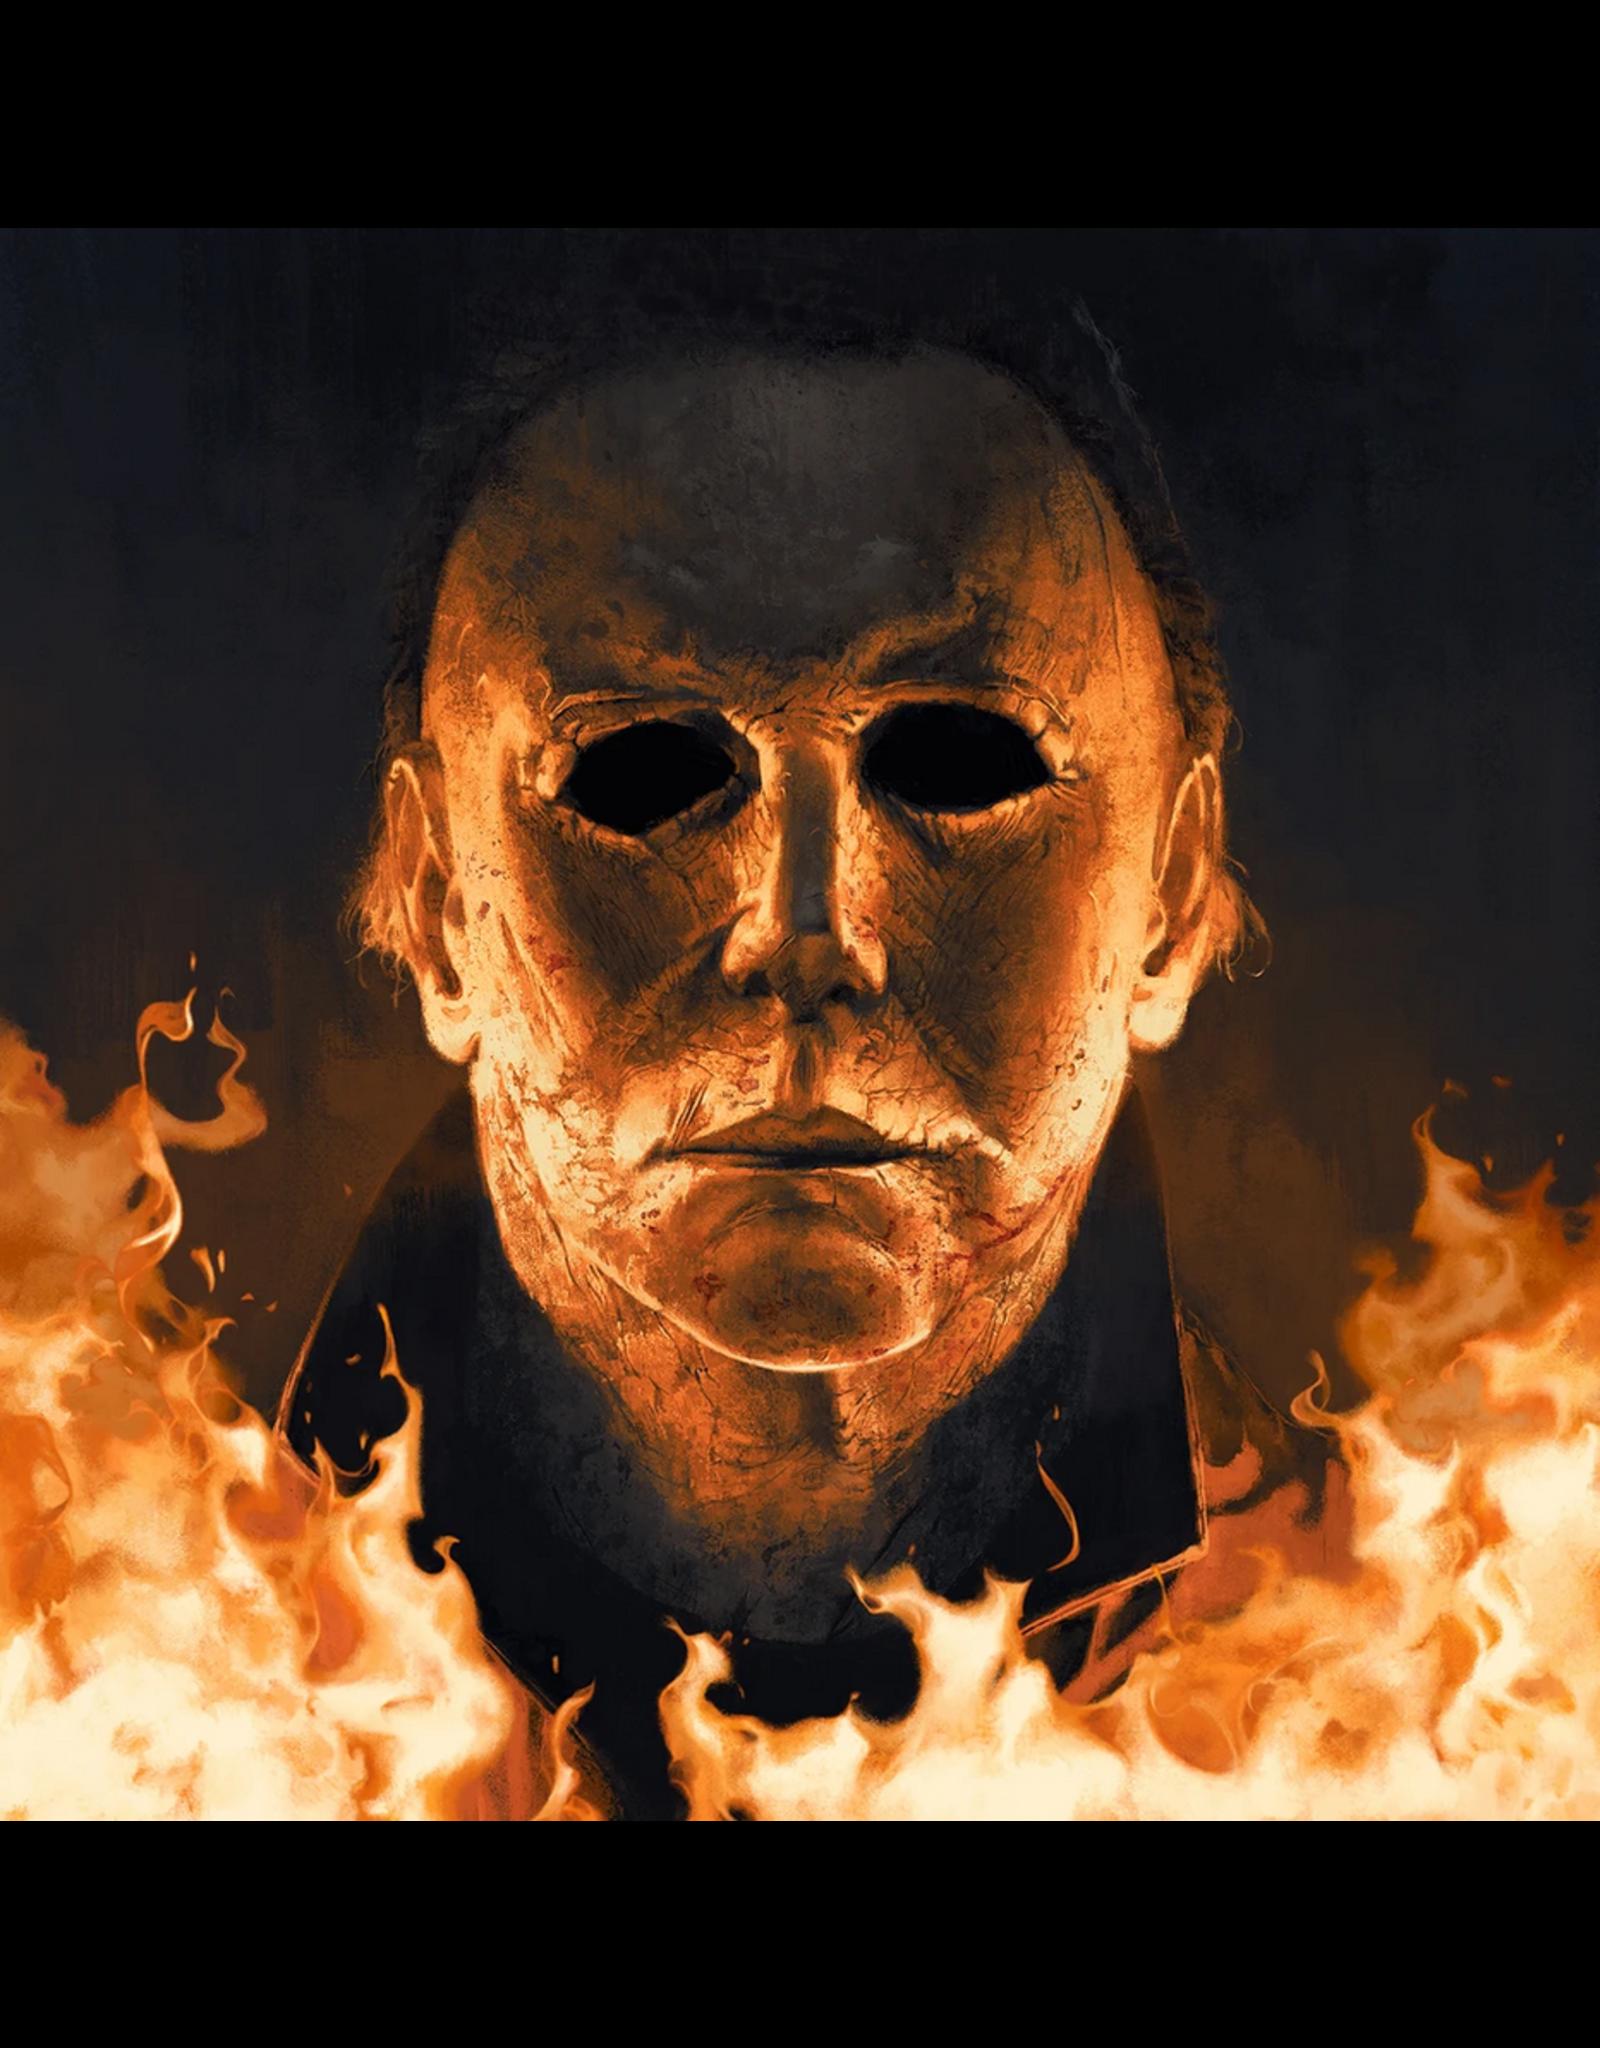 New Vinyl John Carpenter - Halloween (2018) OST Expanded Edition 2LP